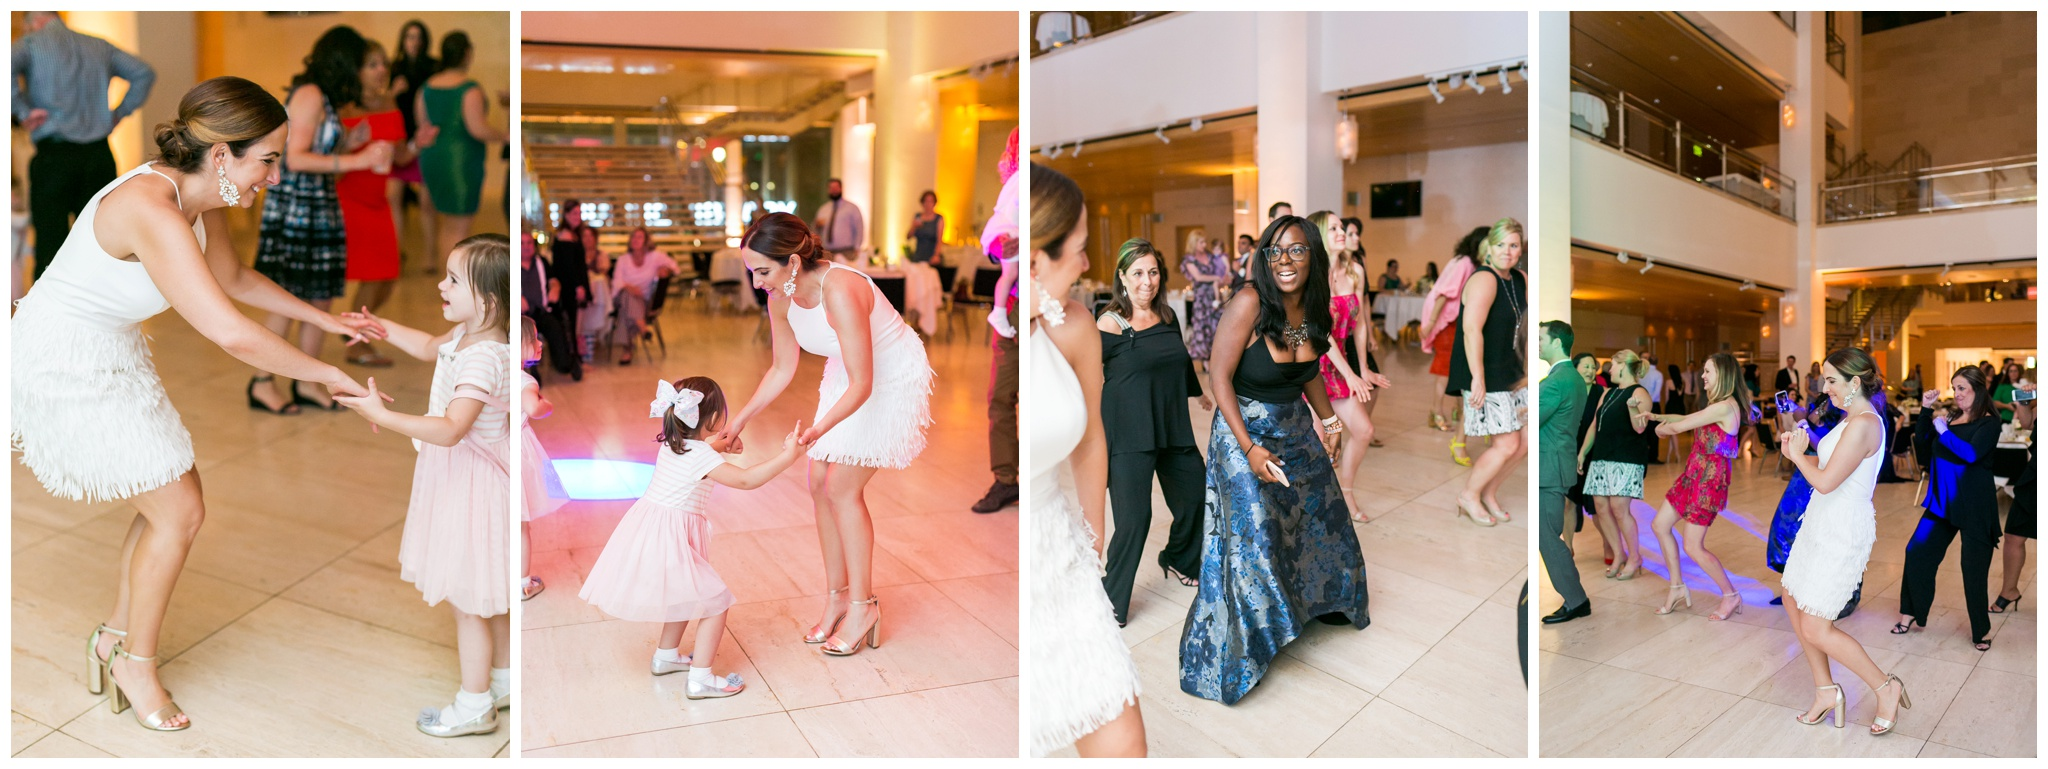 overture_center_wedding_madison_wisconsin_wedding_photographers_3969.jpg